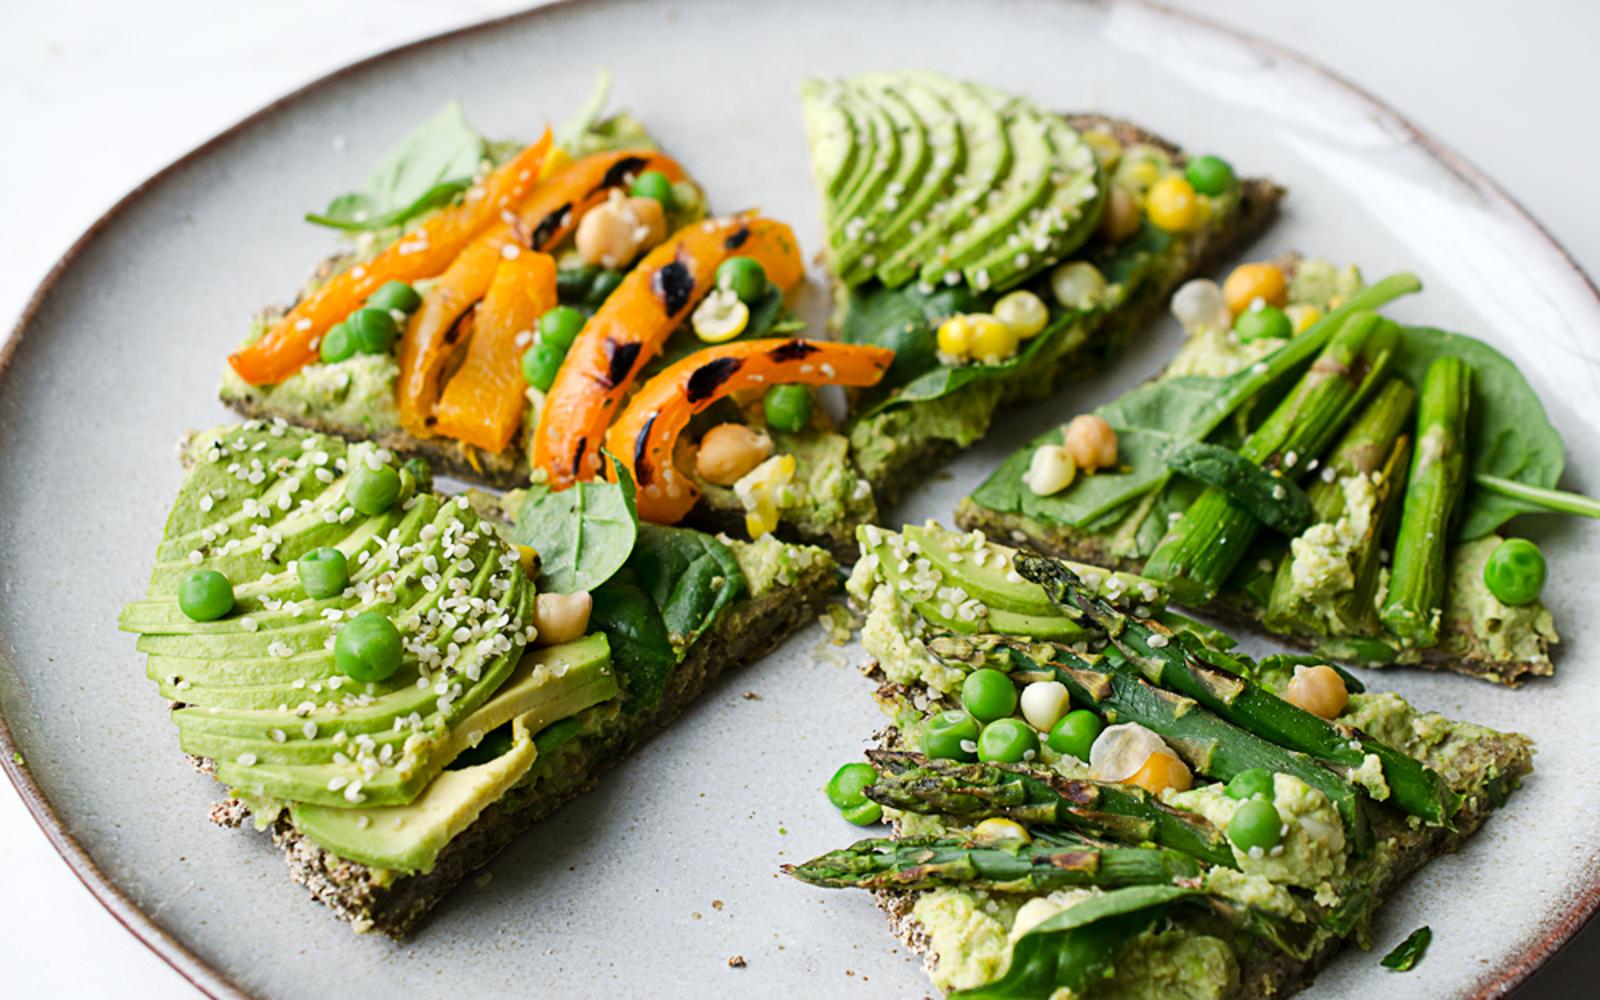 Broccoli Pizza Crust and Green Pea Hummus